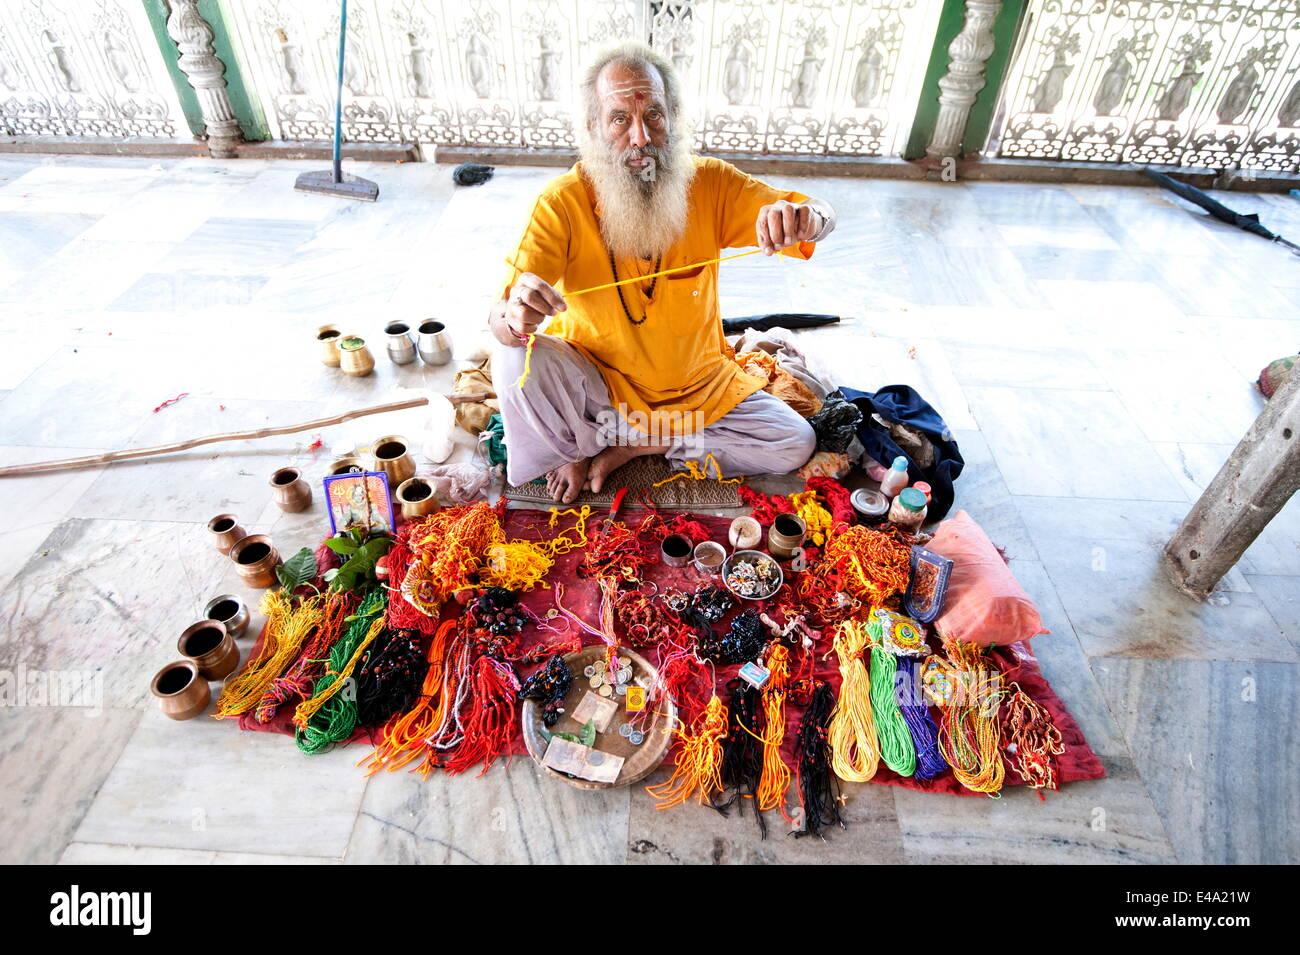 Hindu pundit selling rolimoli (puja wrist threads) in the Sivadol temple, built in 1734, Sivasagar, Assam, India, - Stock Image